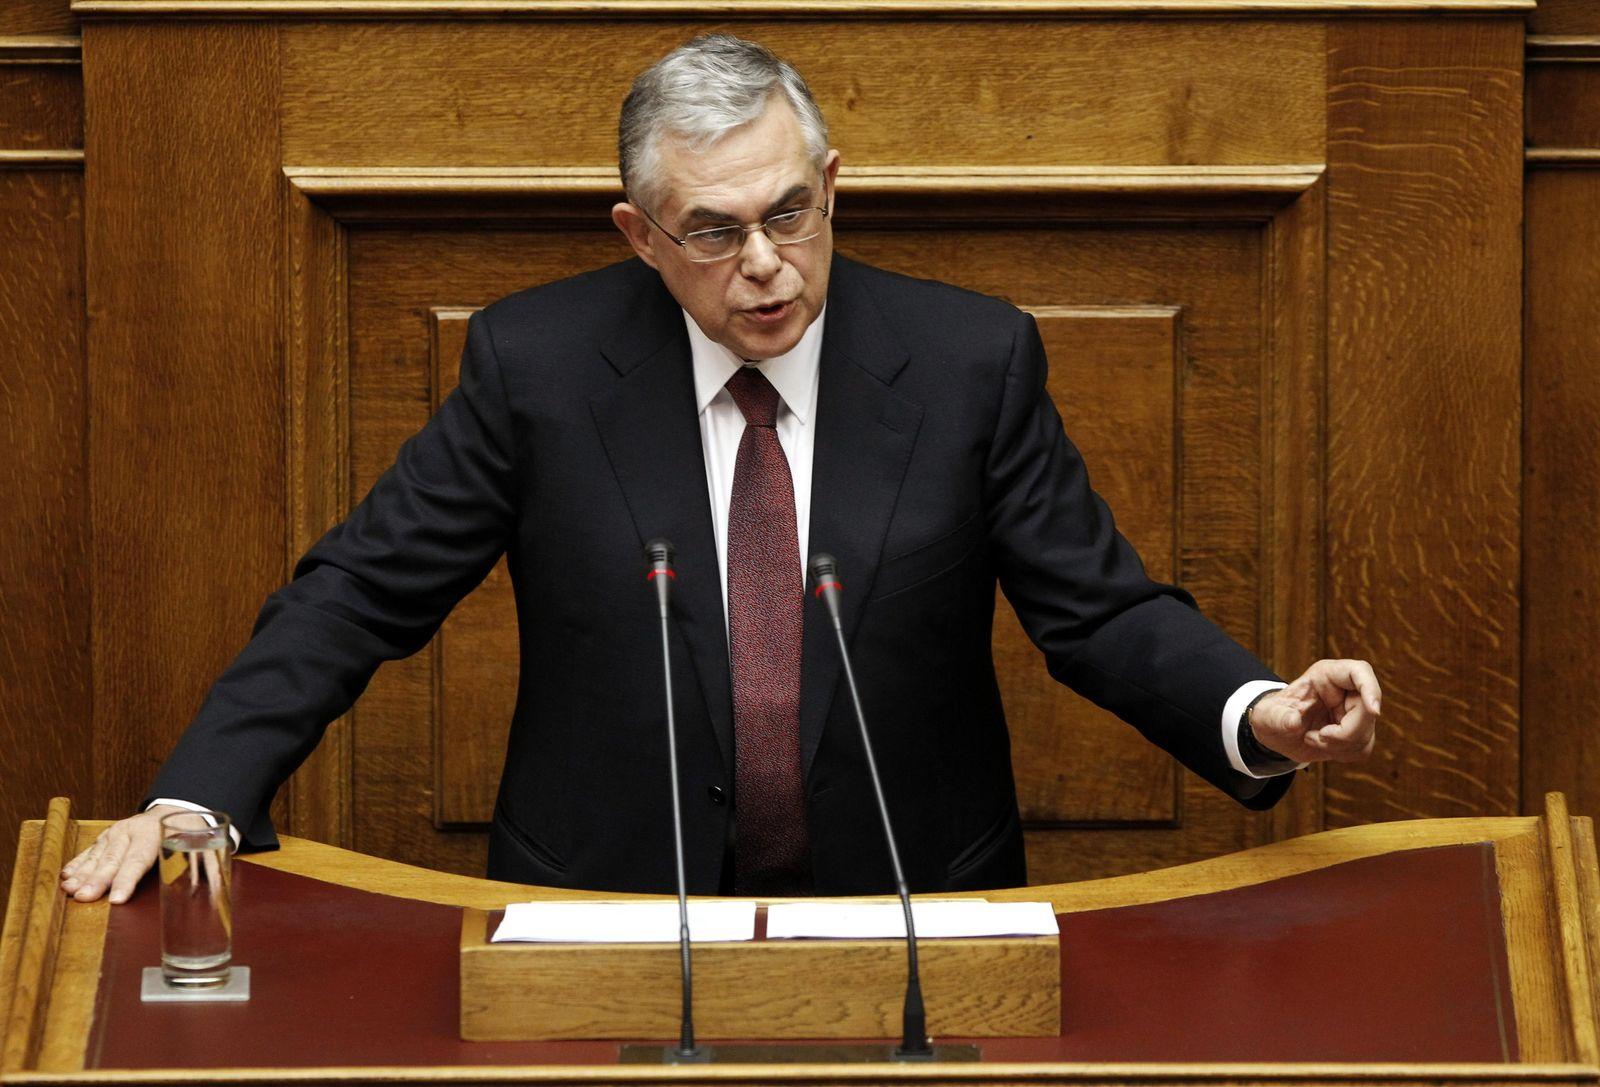 Griechenland / Athen / Papademos im Parlament